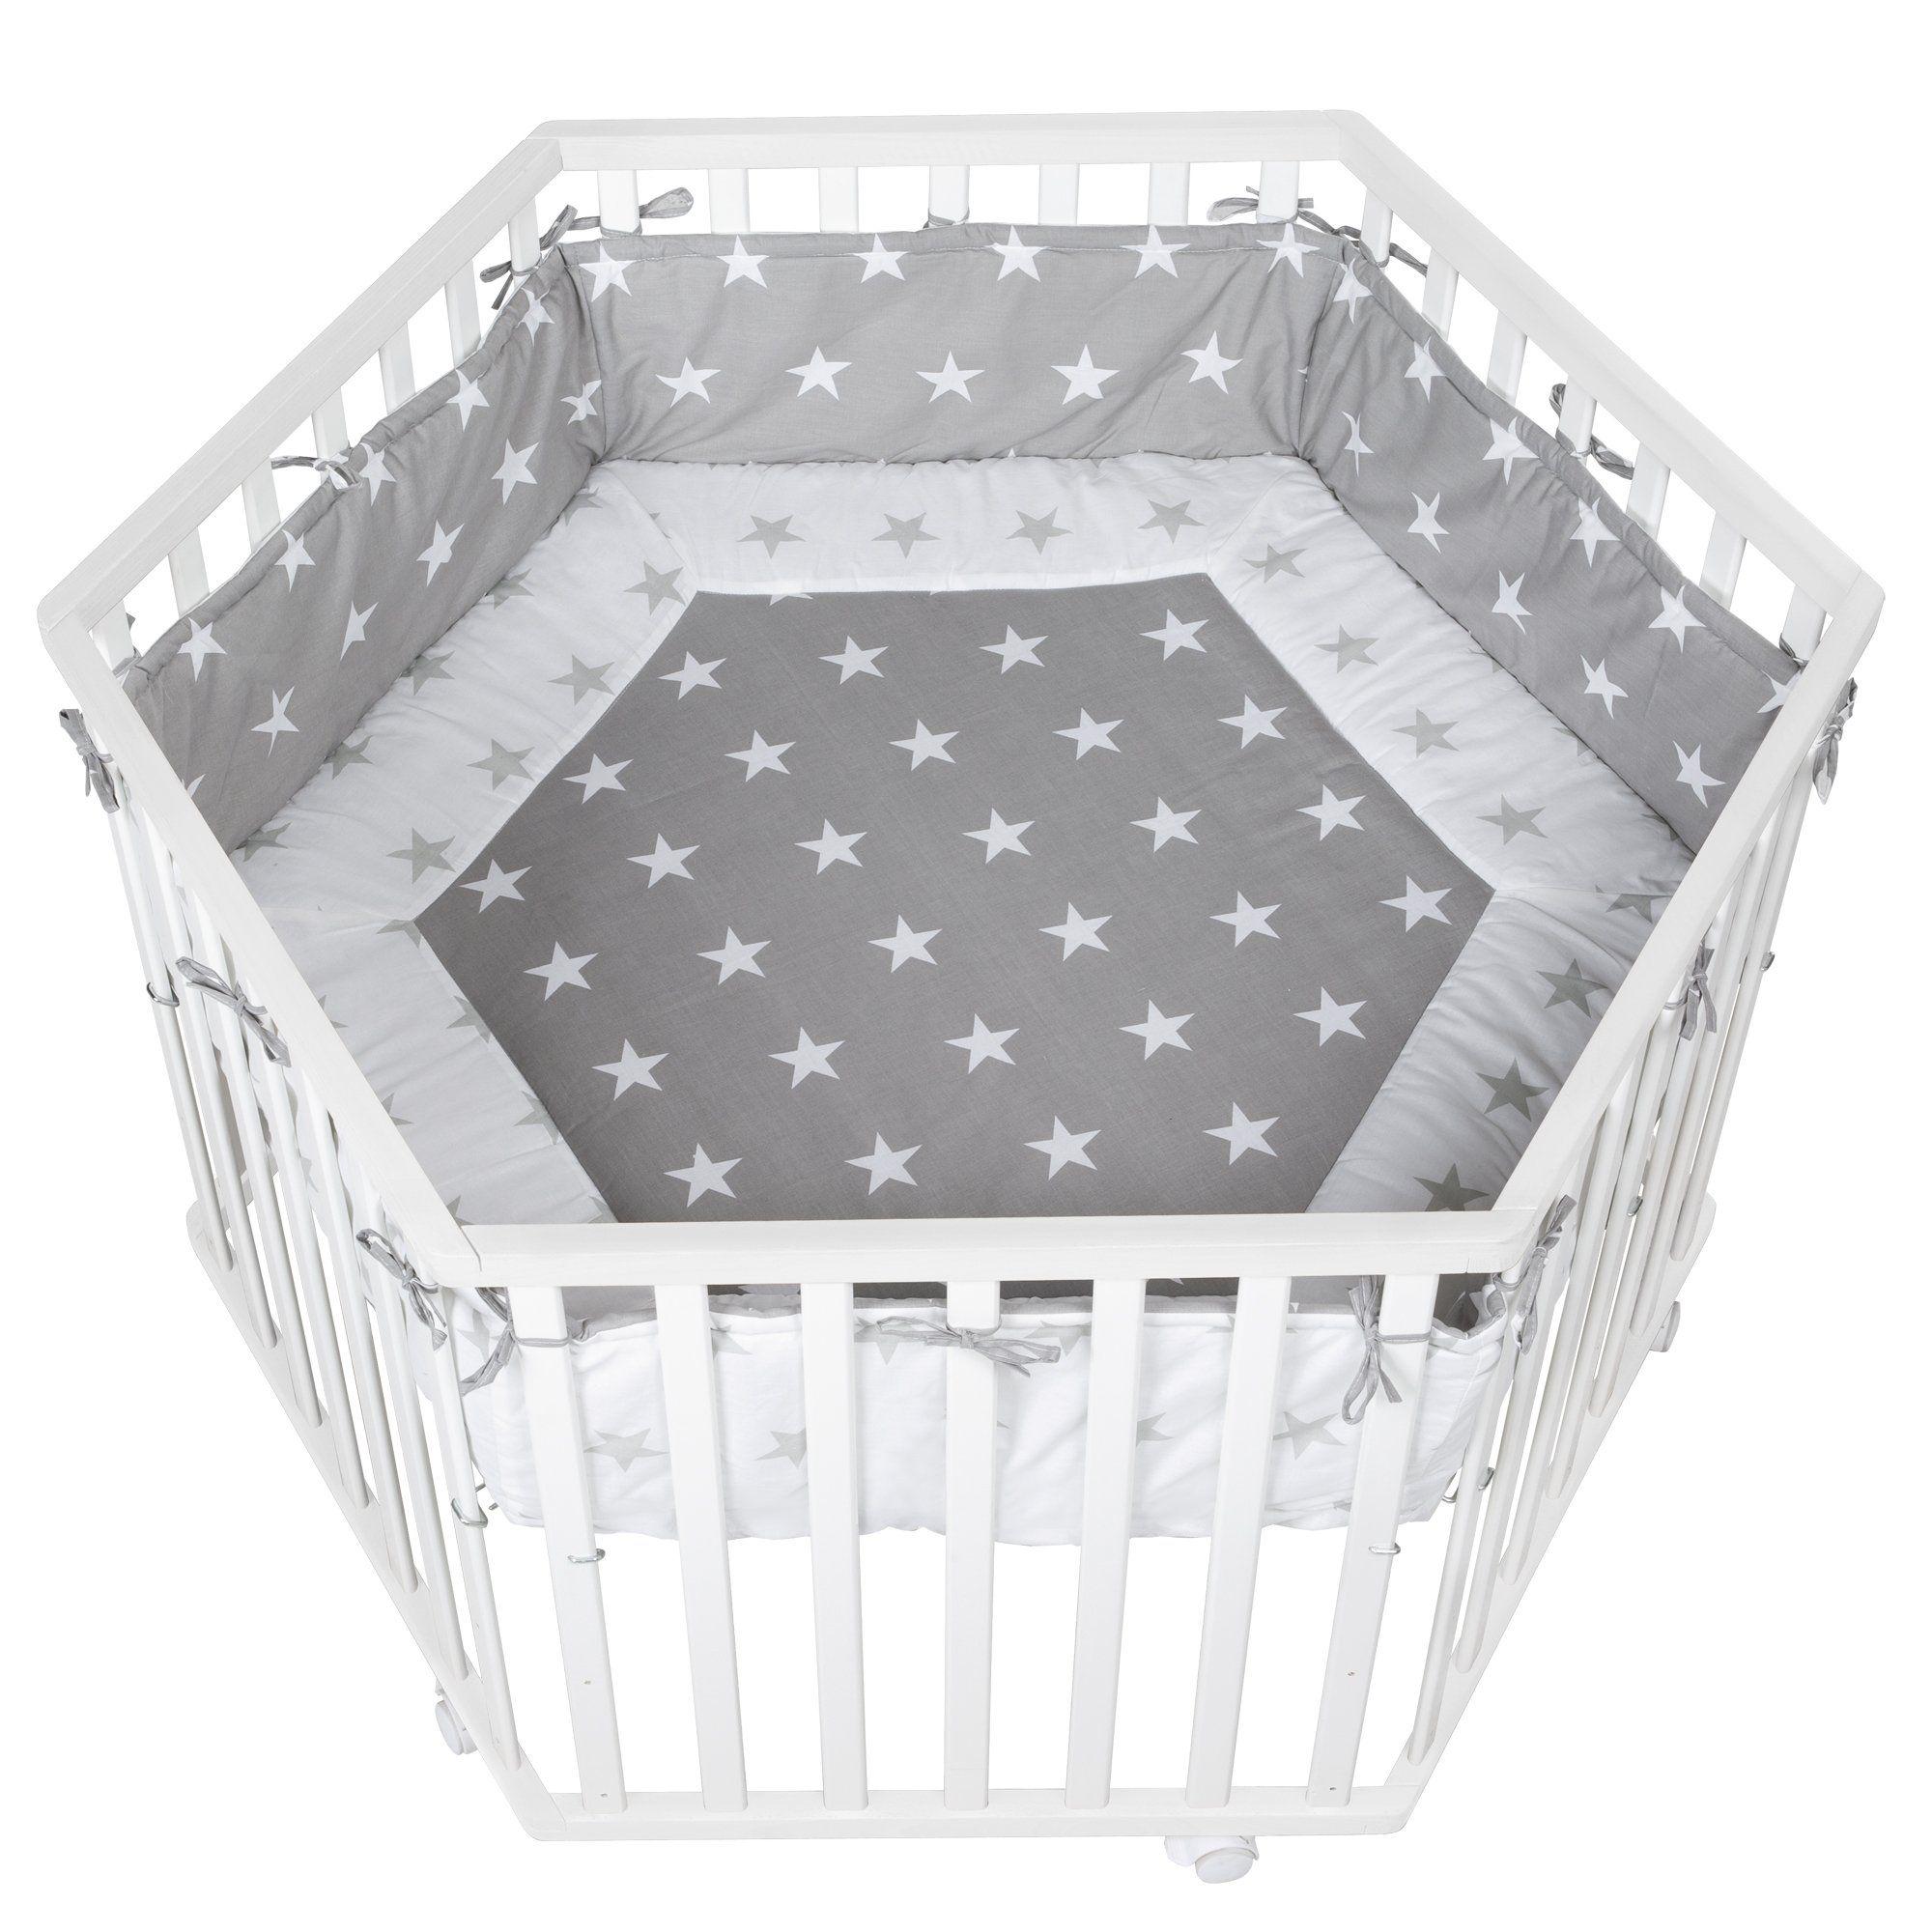 Roba Kids Cosiplay Park Hexagonal Plastic Laundry Basket Home